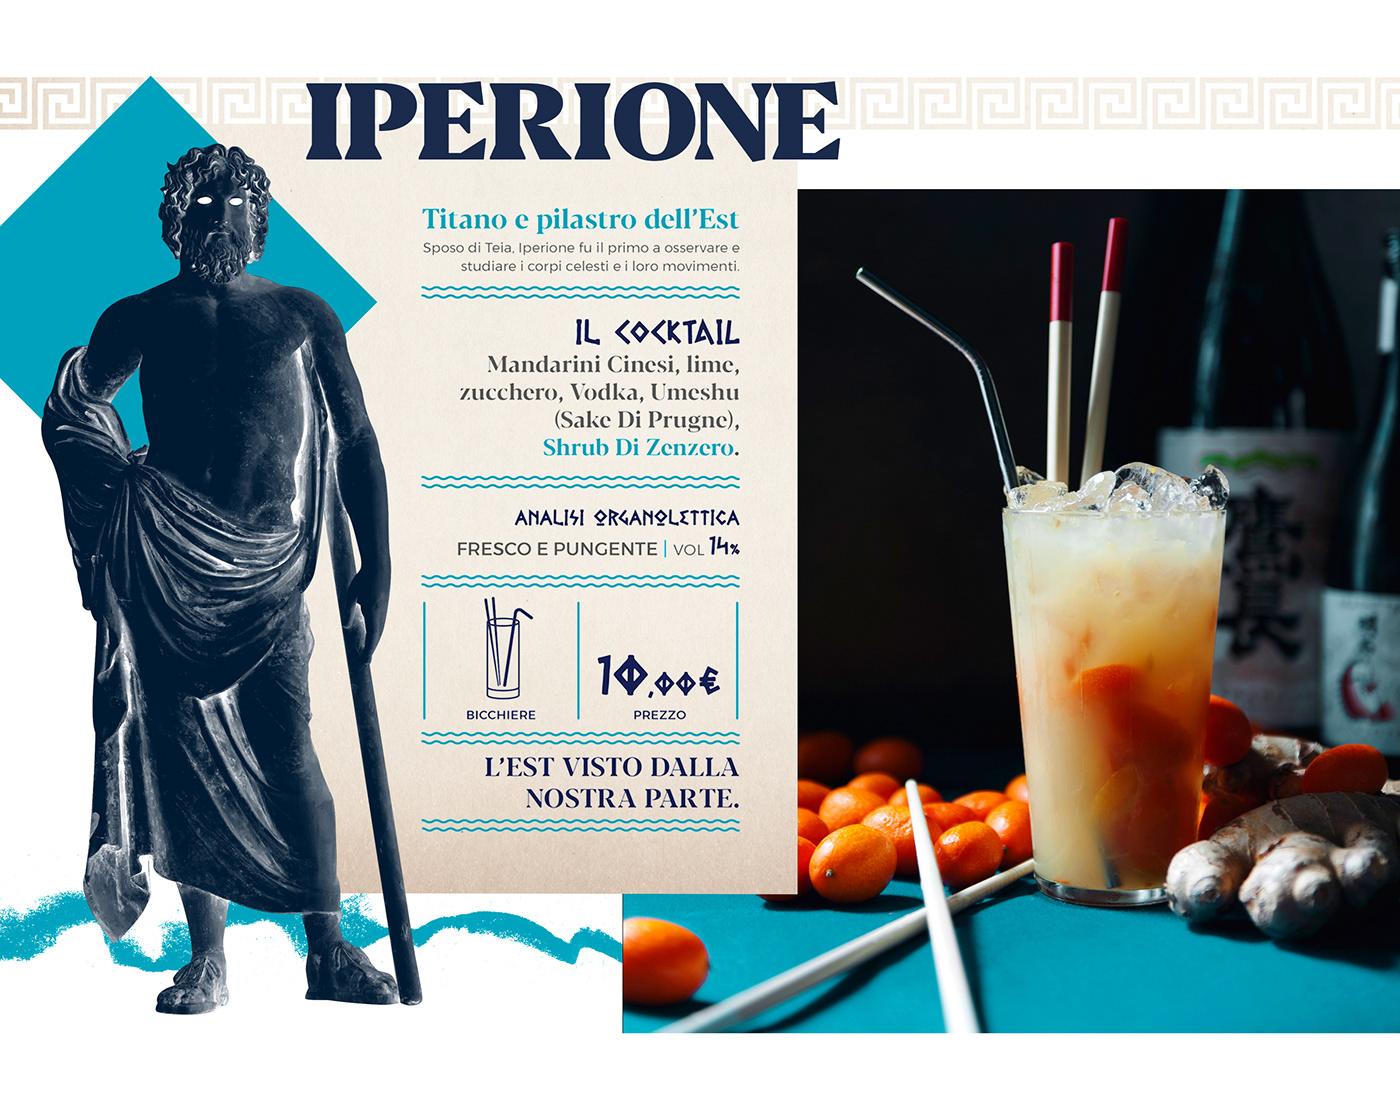 menu cafe mythology titans Greece graphic copywriting  graphic design  art direction  cocktail